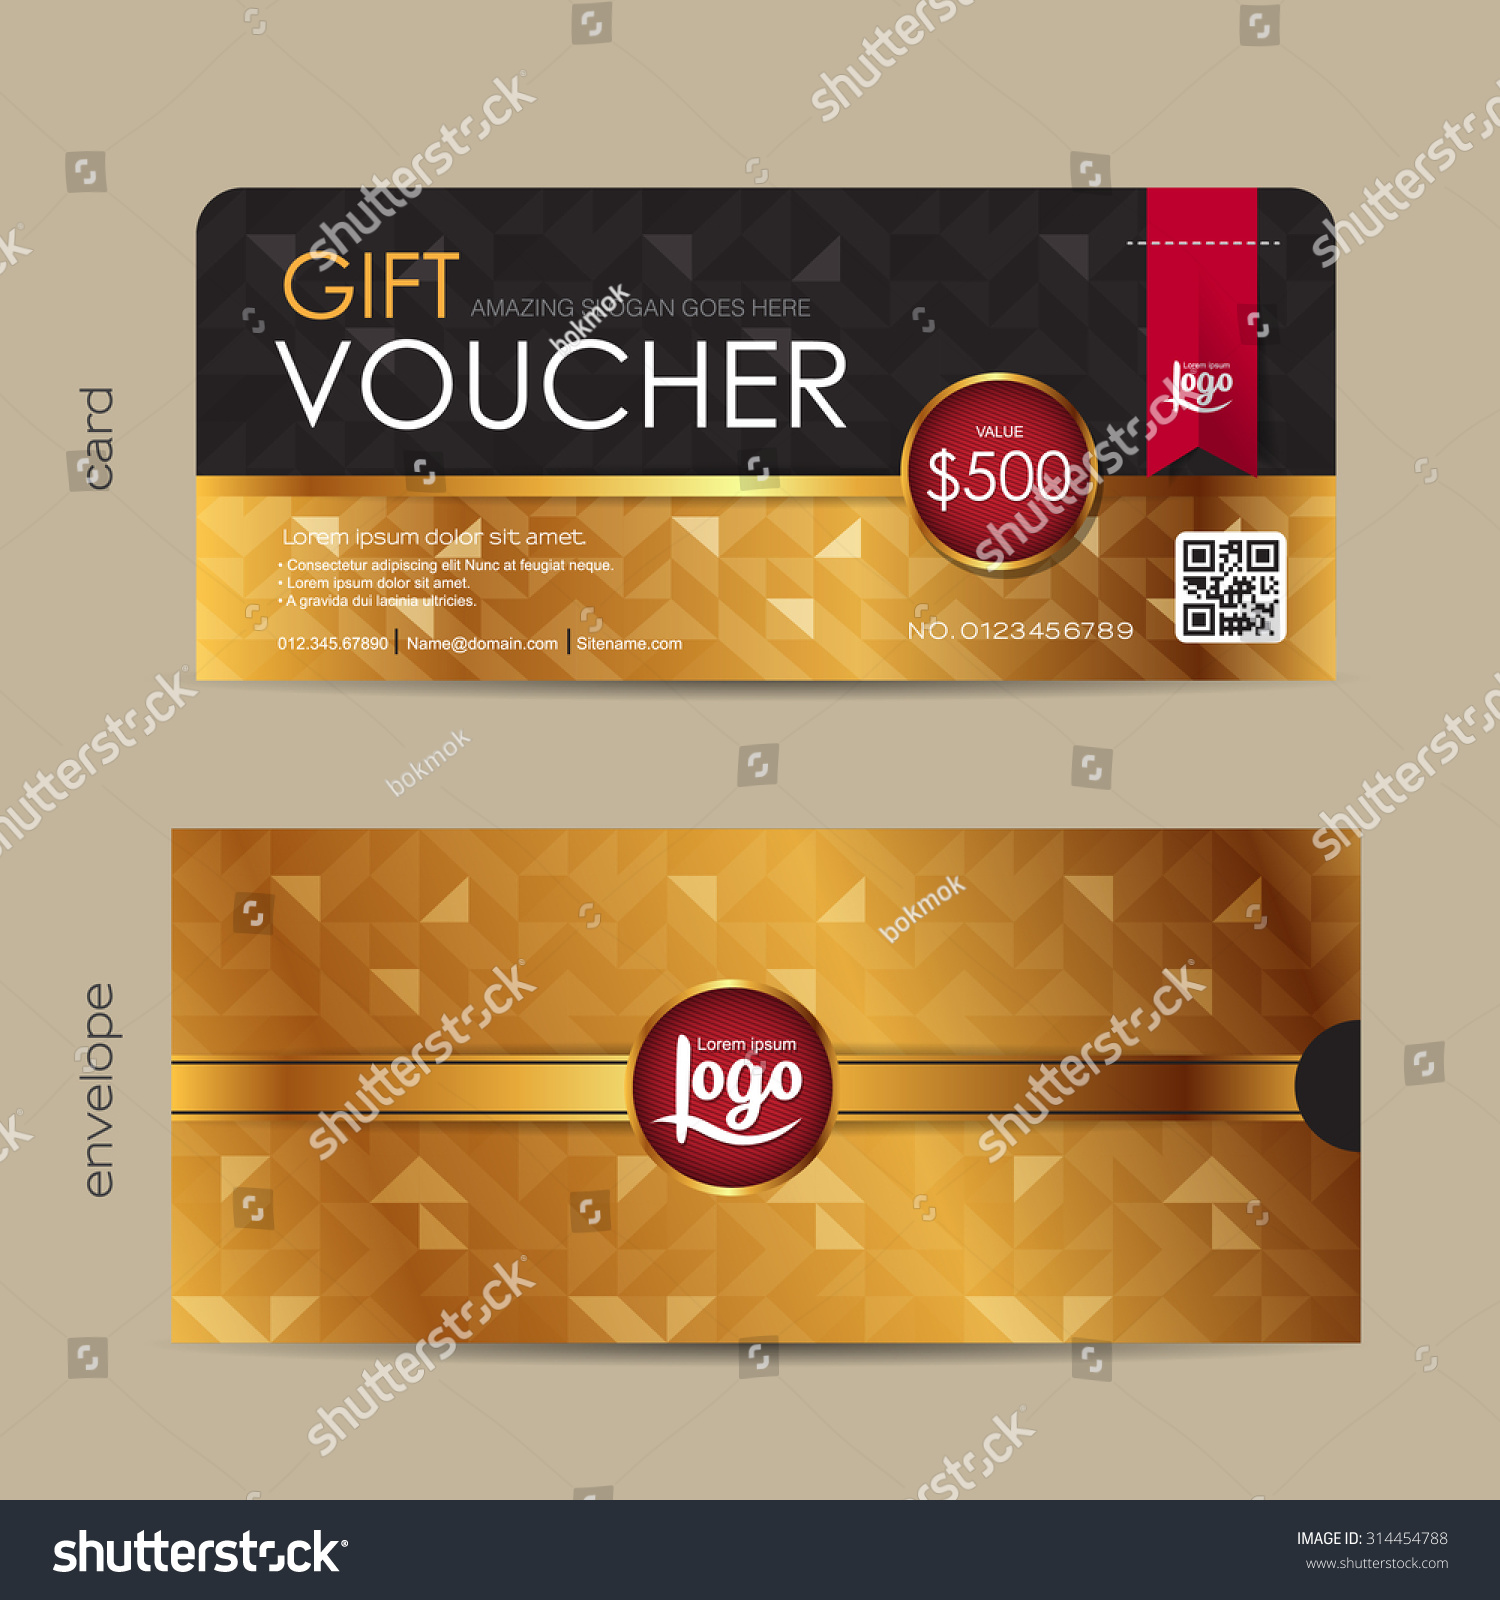 Doc13001390 Voucher Design Template Free Free Voucher Design – Design Gift Vouchers Free